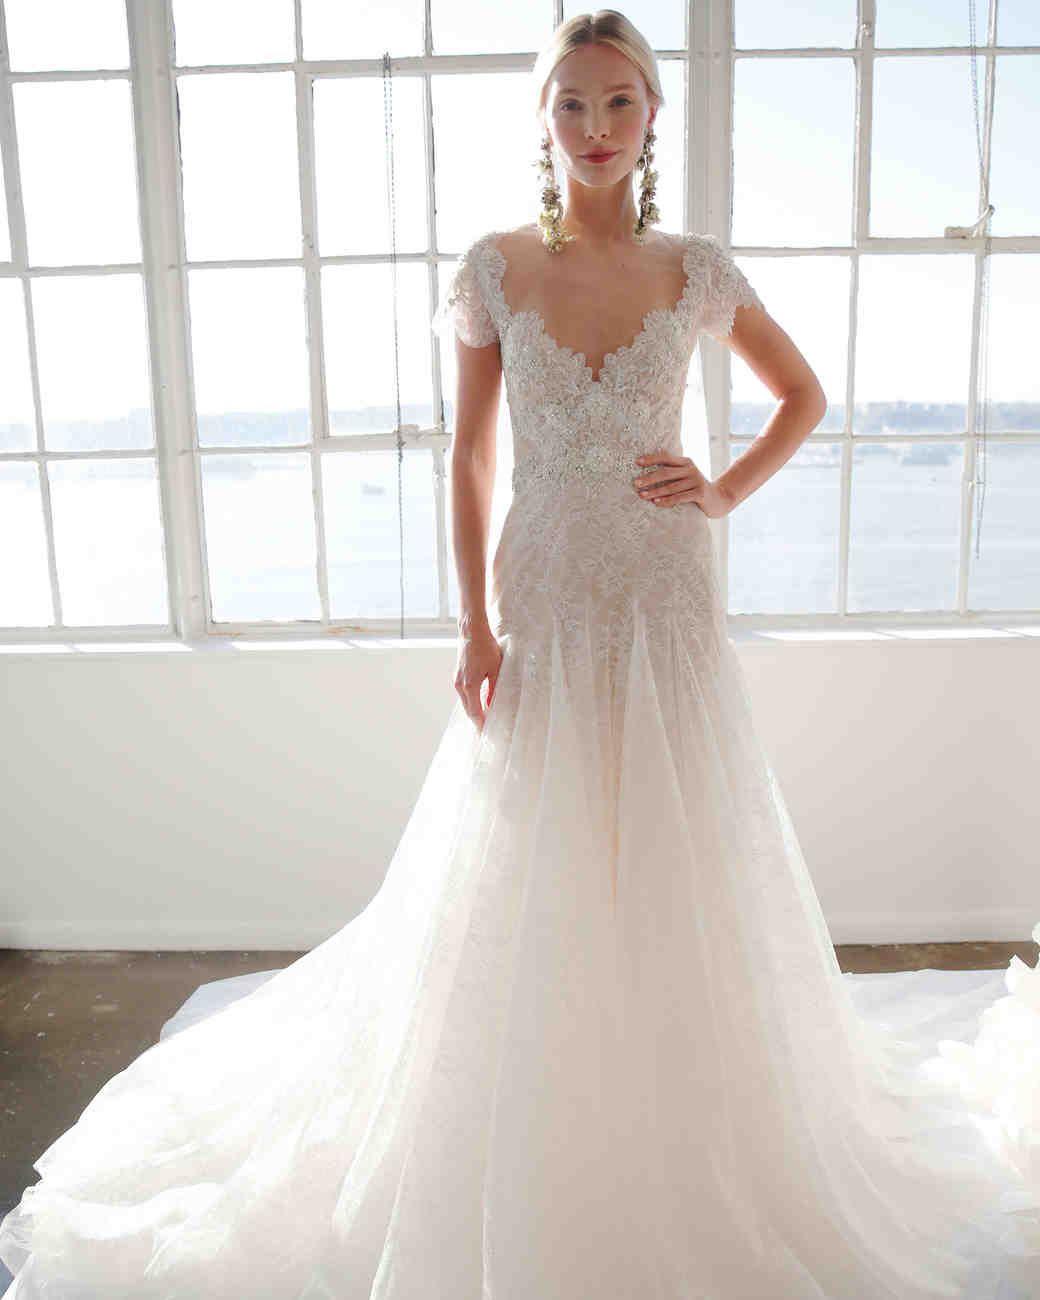 Marchesa Wedding Dress Price - Best Wedding Dress for Pear Shaped ...